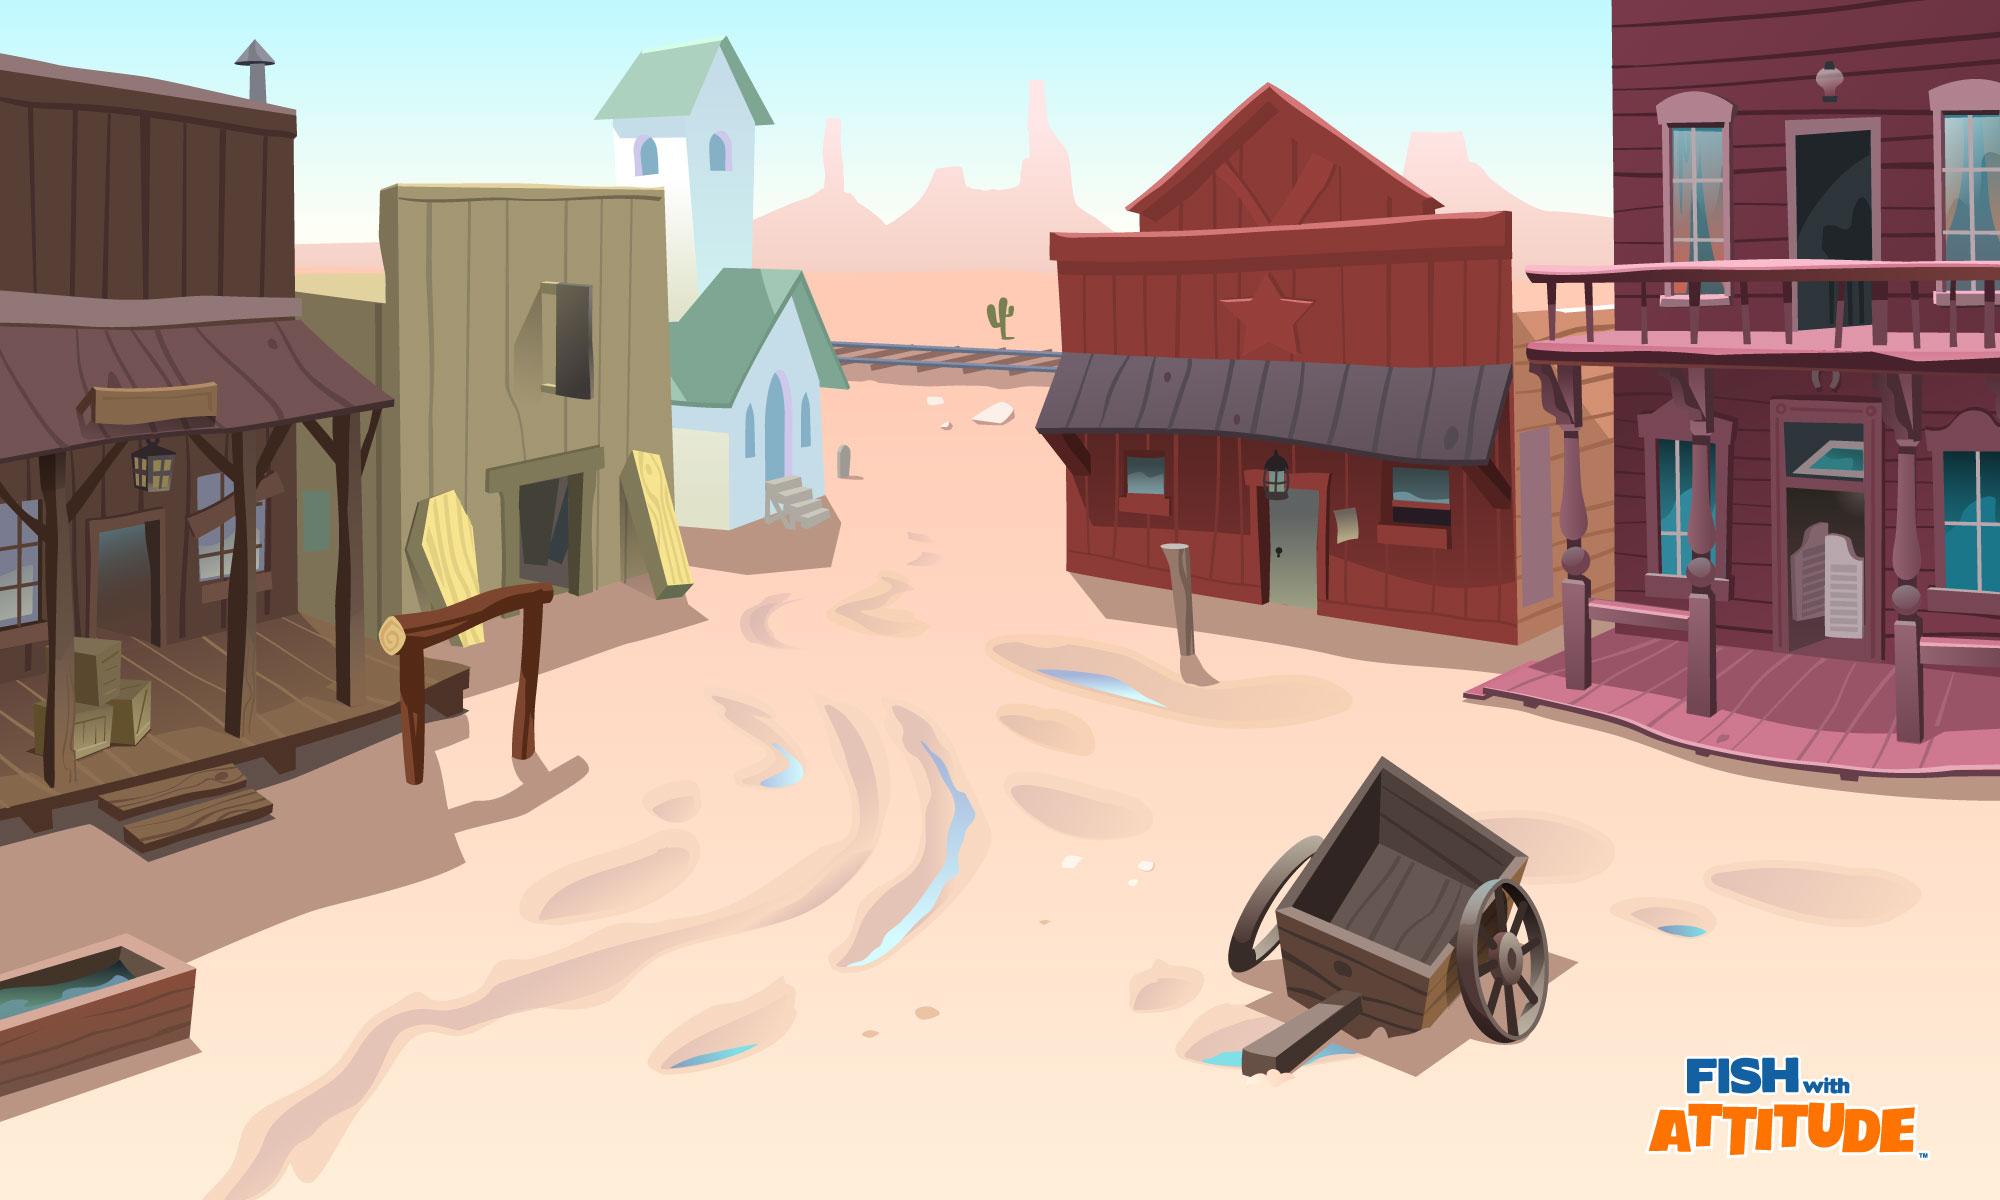 fwa_cowboy_background.jpg